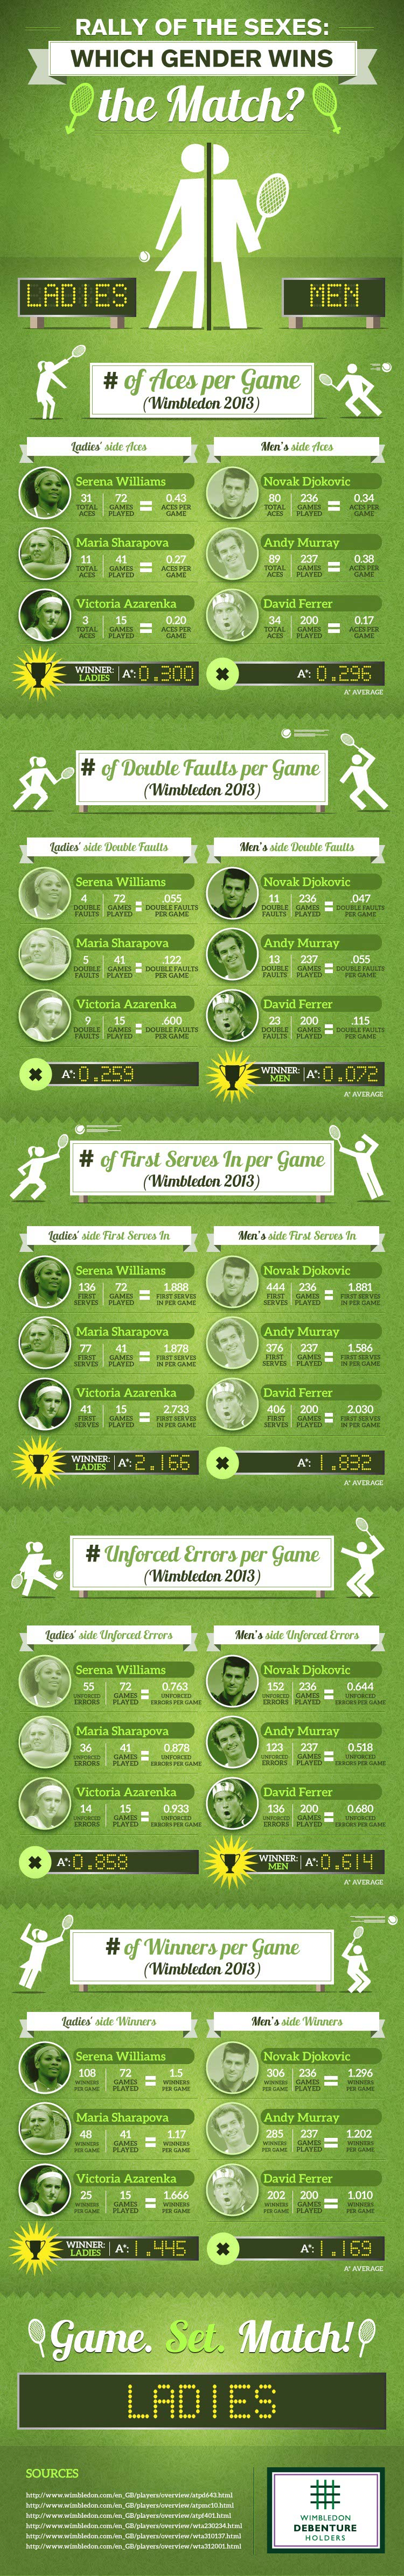 Wimbledon 2013 Scores-Infographic